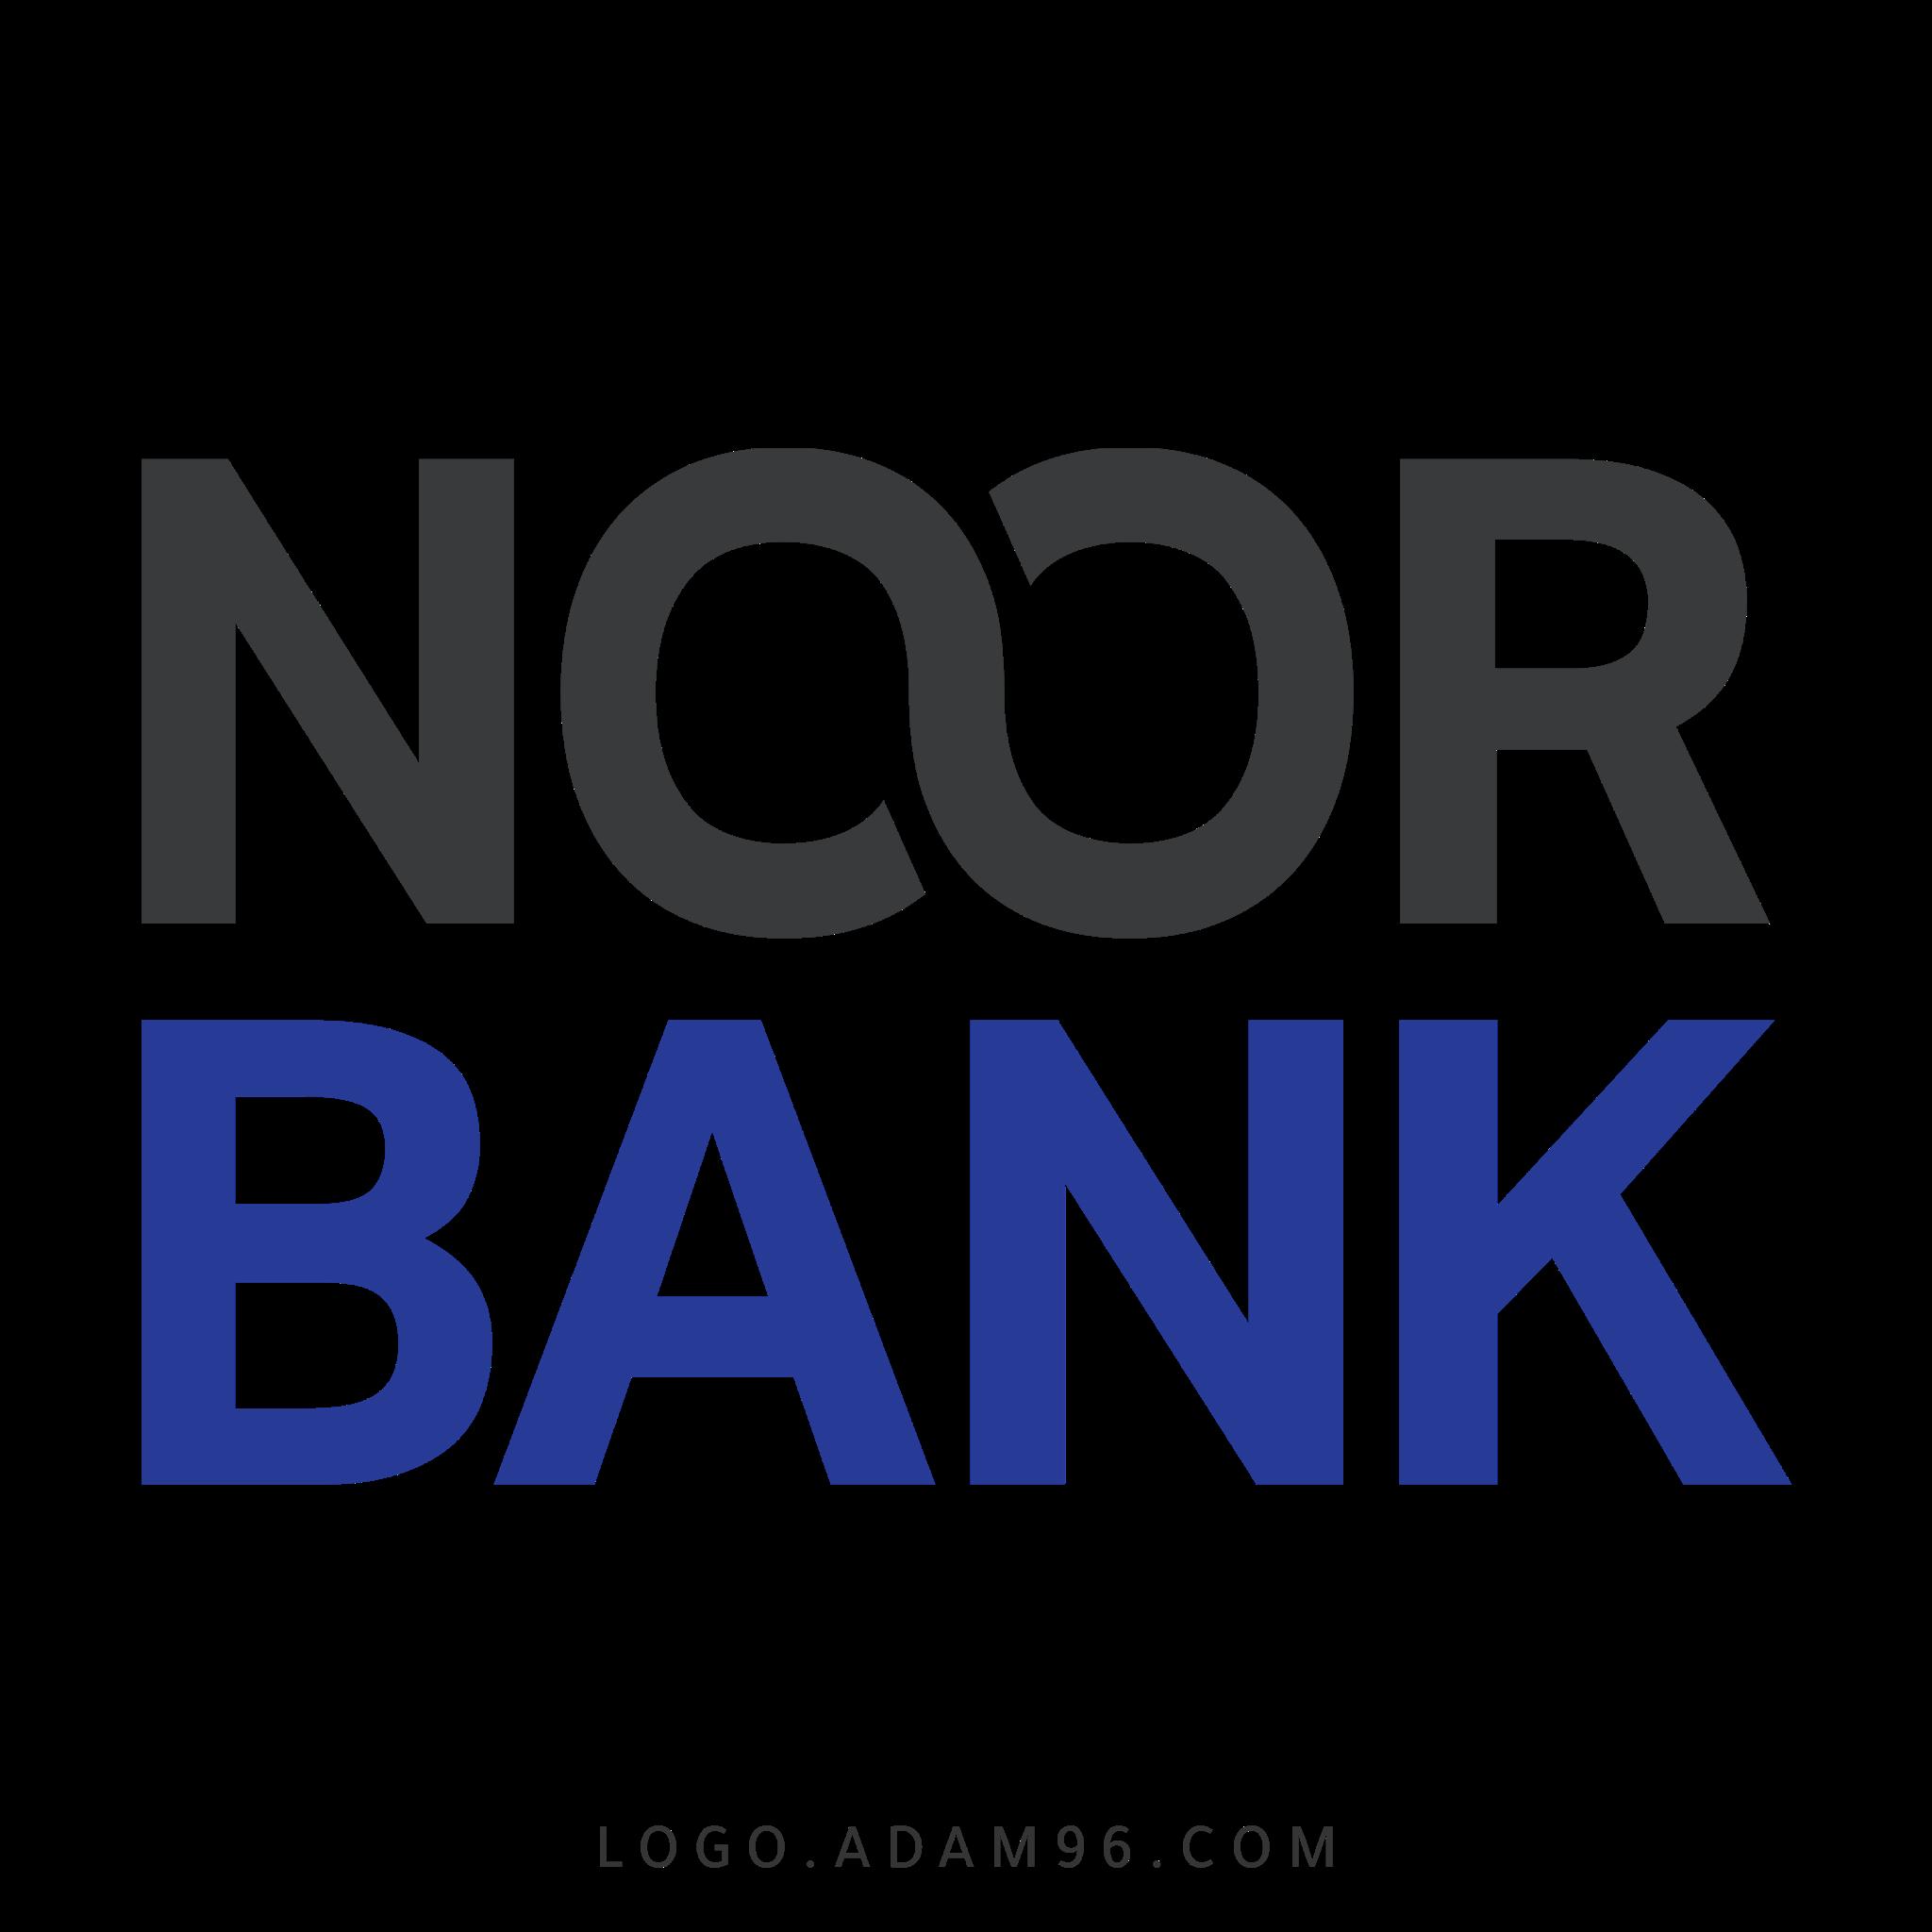 تحميل شعار بنك نور الاماراتي لوجو رسمي عالي الجودة PNG